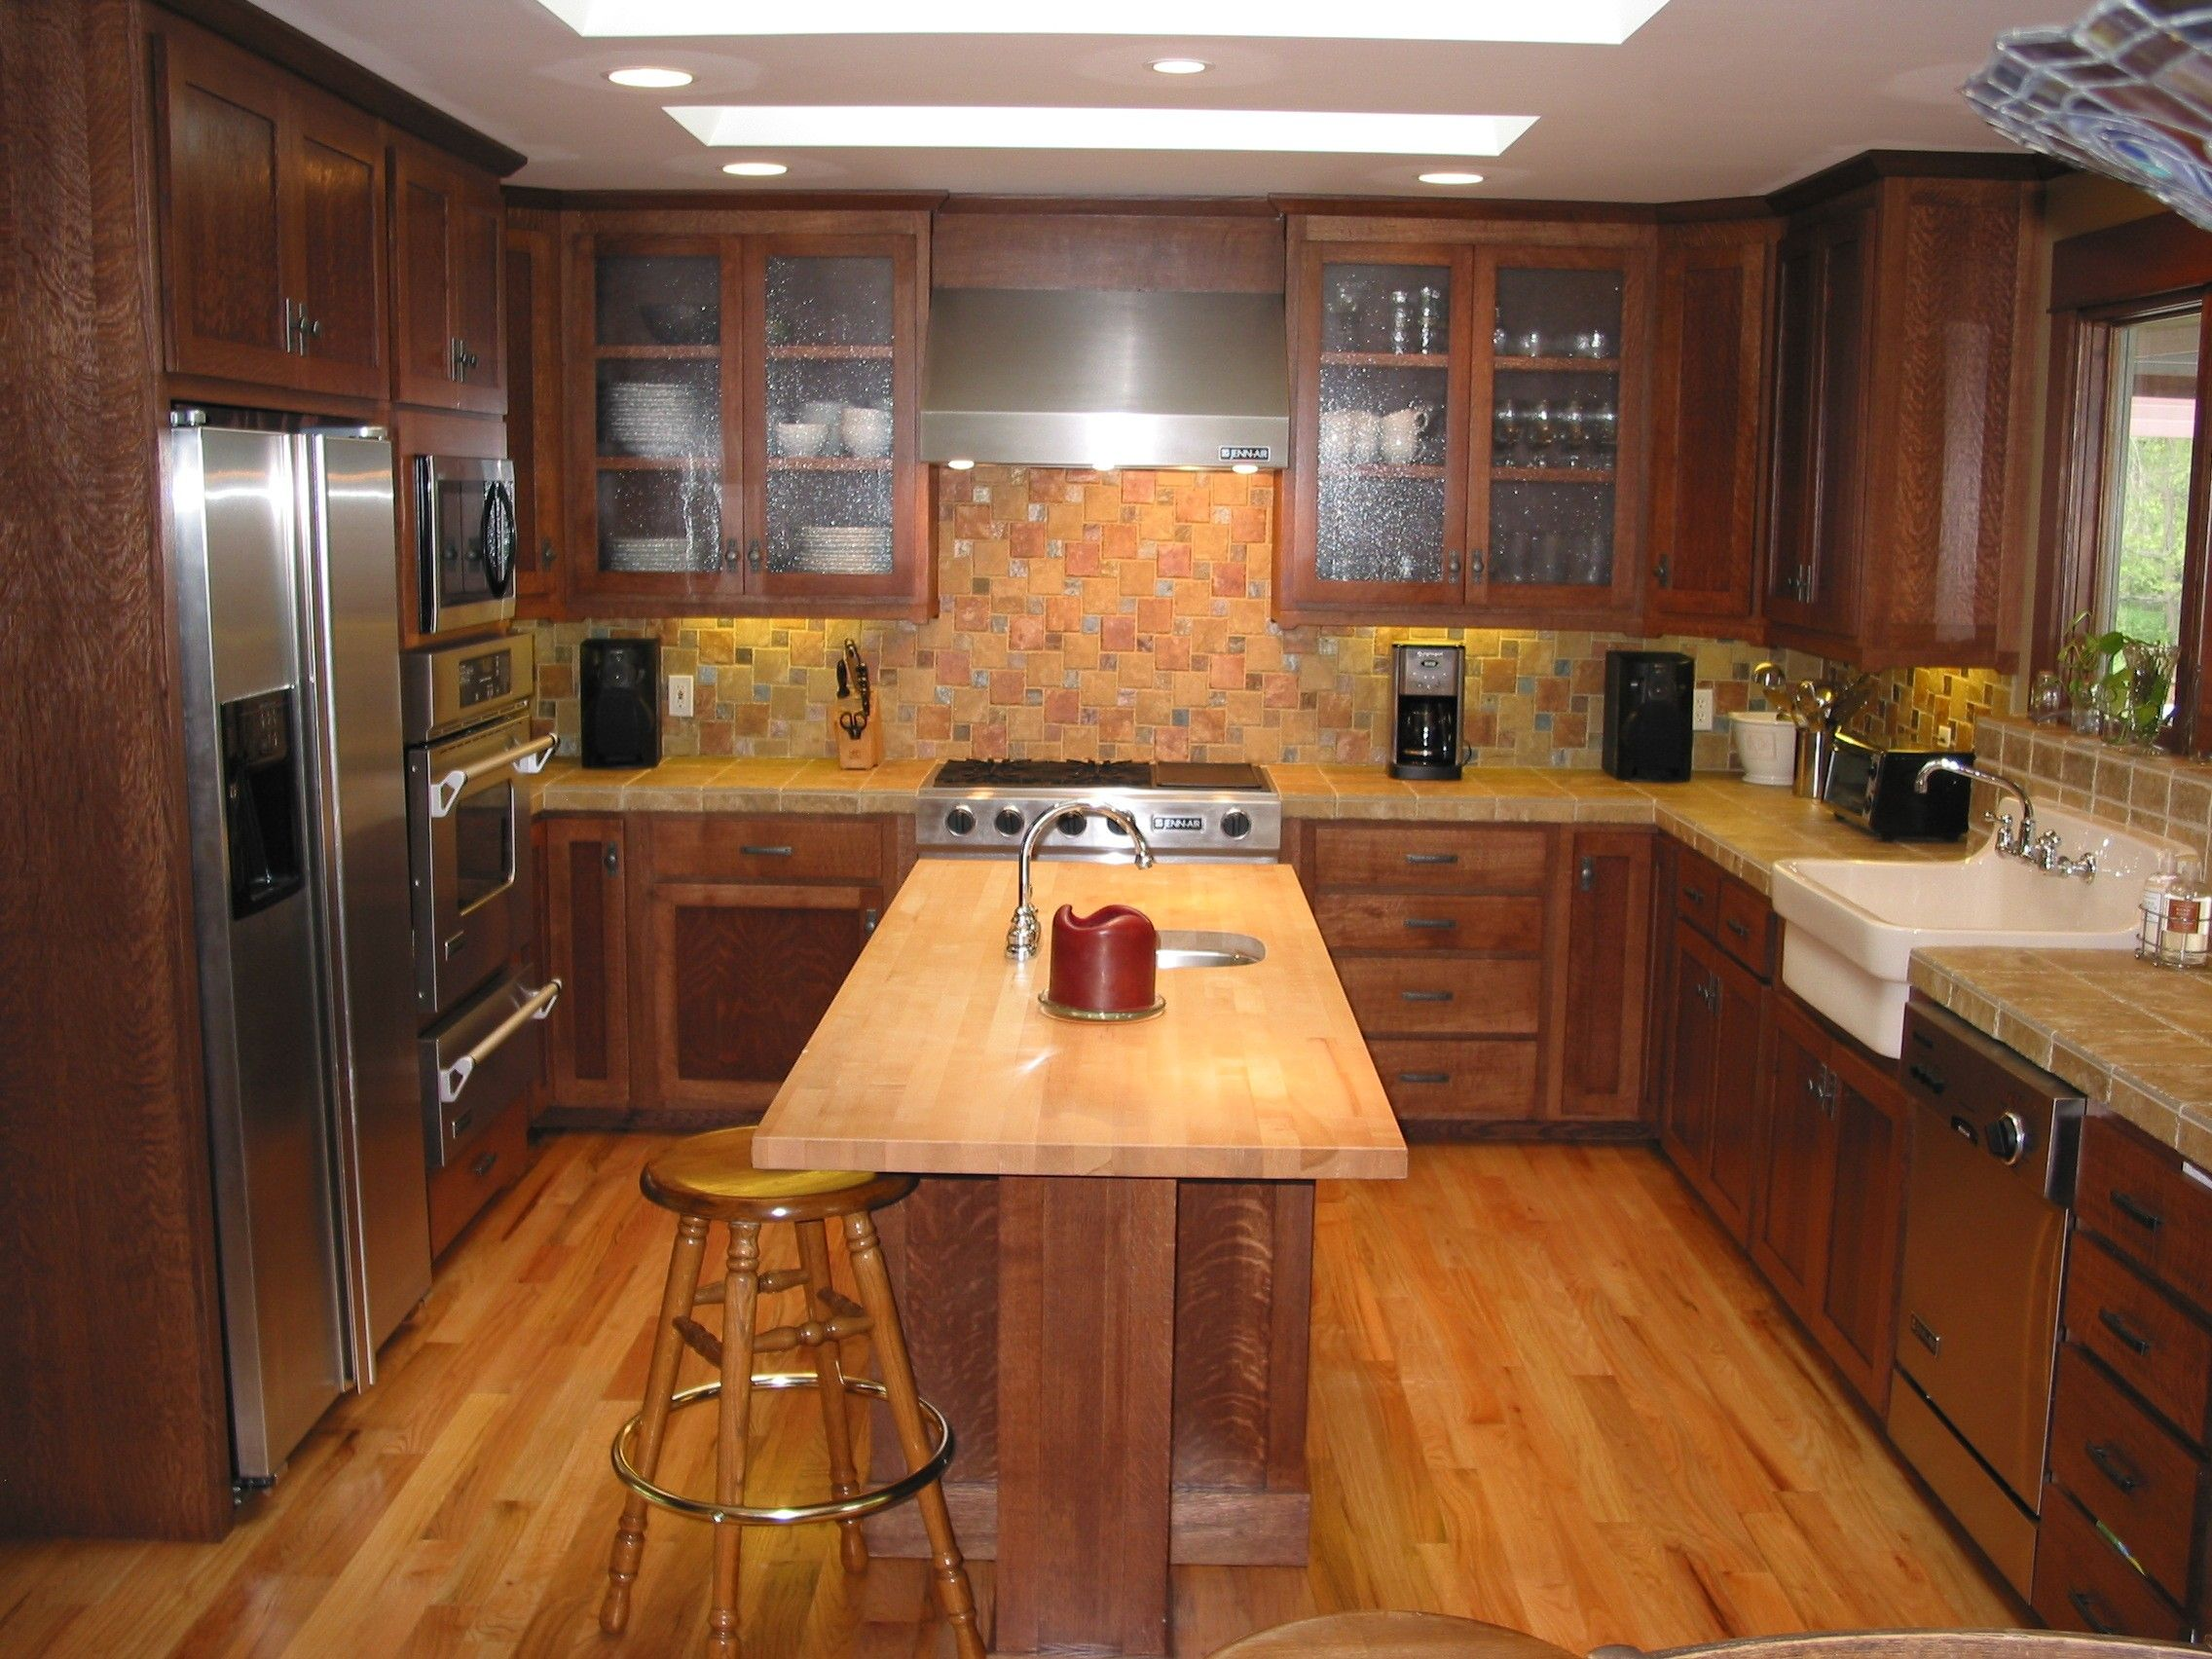 Quarter Sawn Oak Kitchen Click on an image